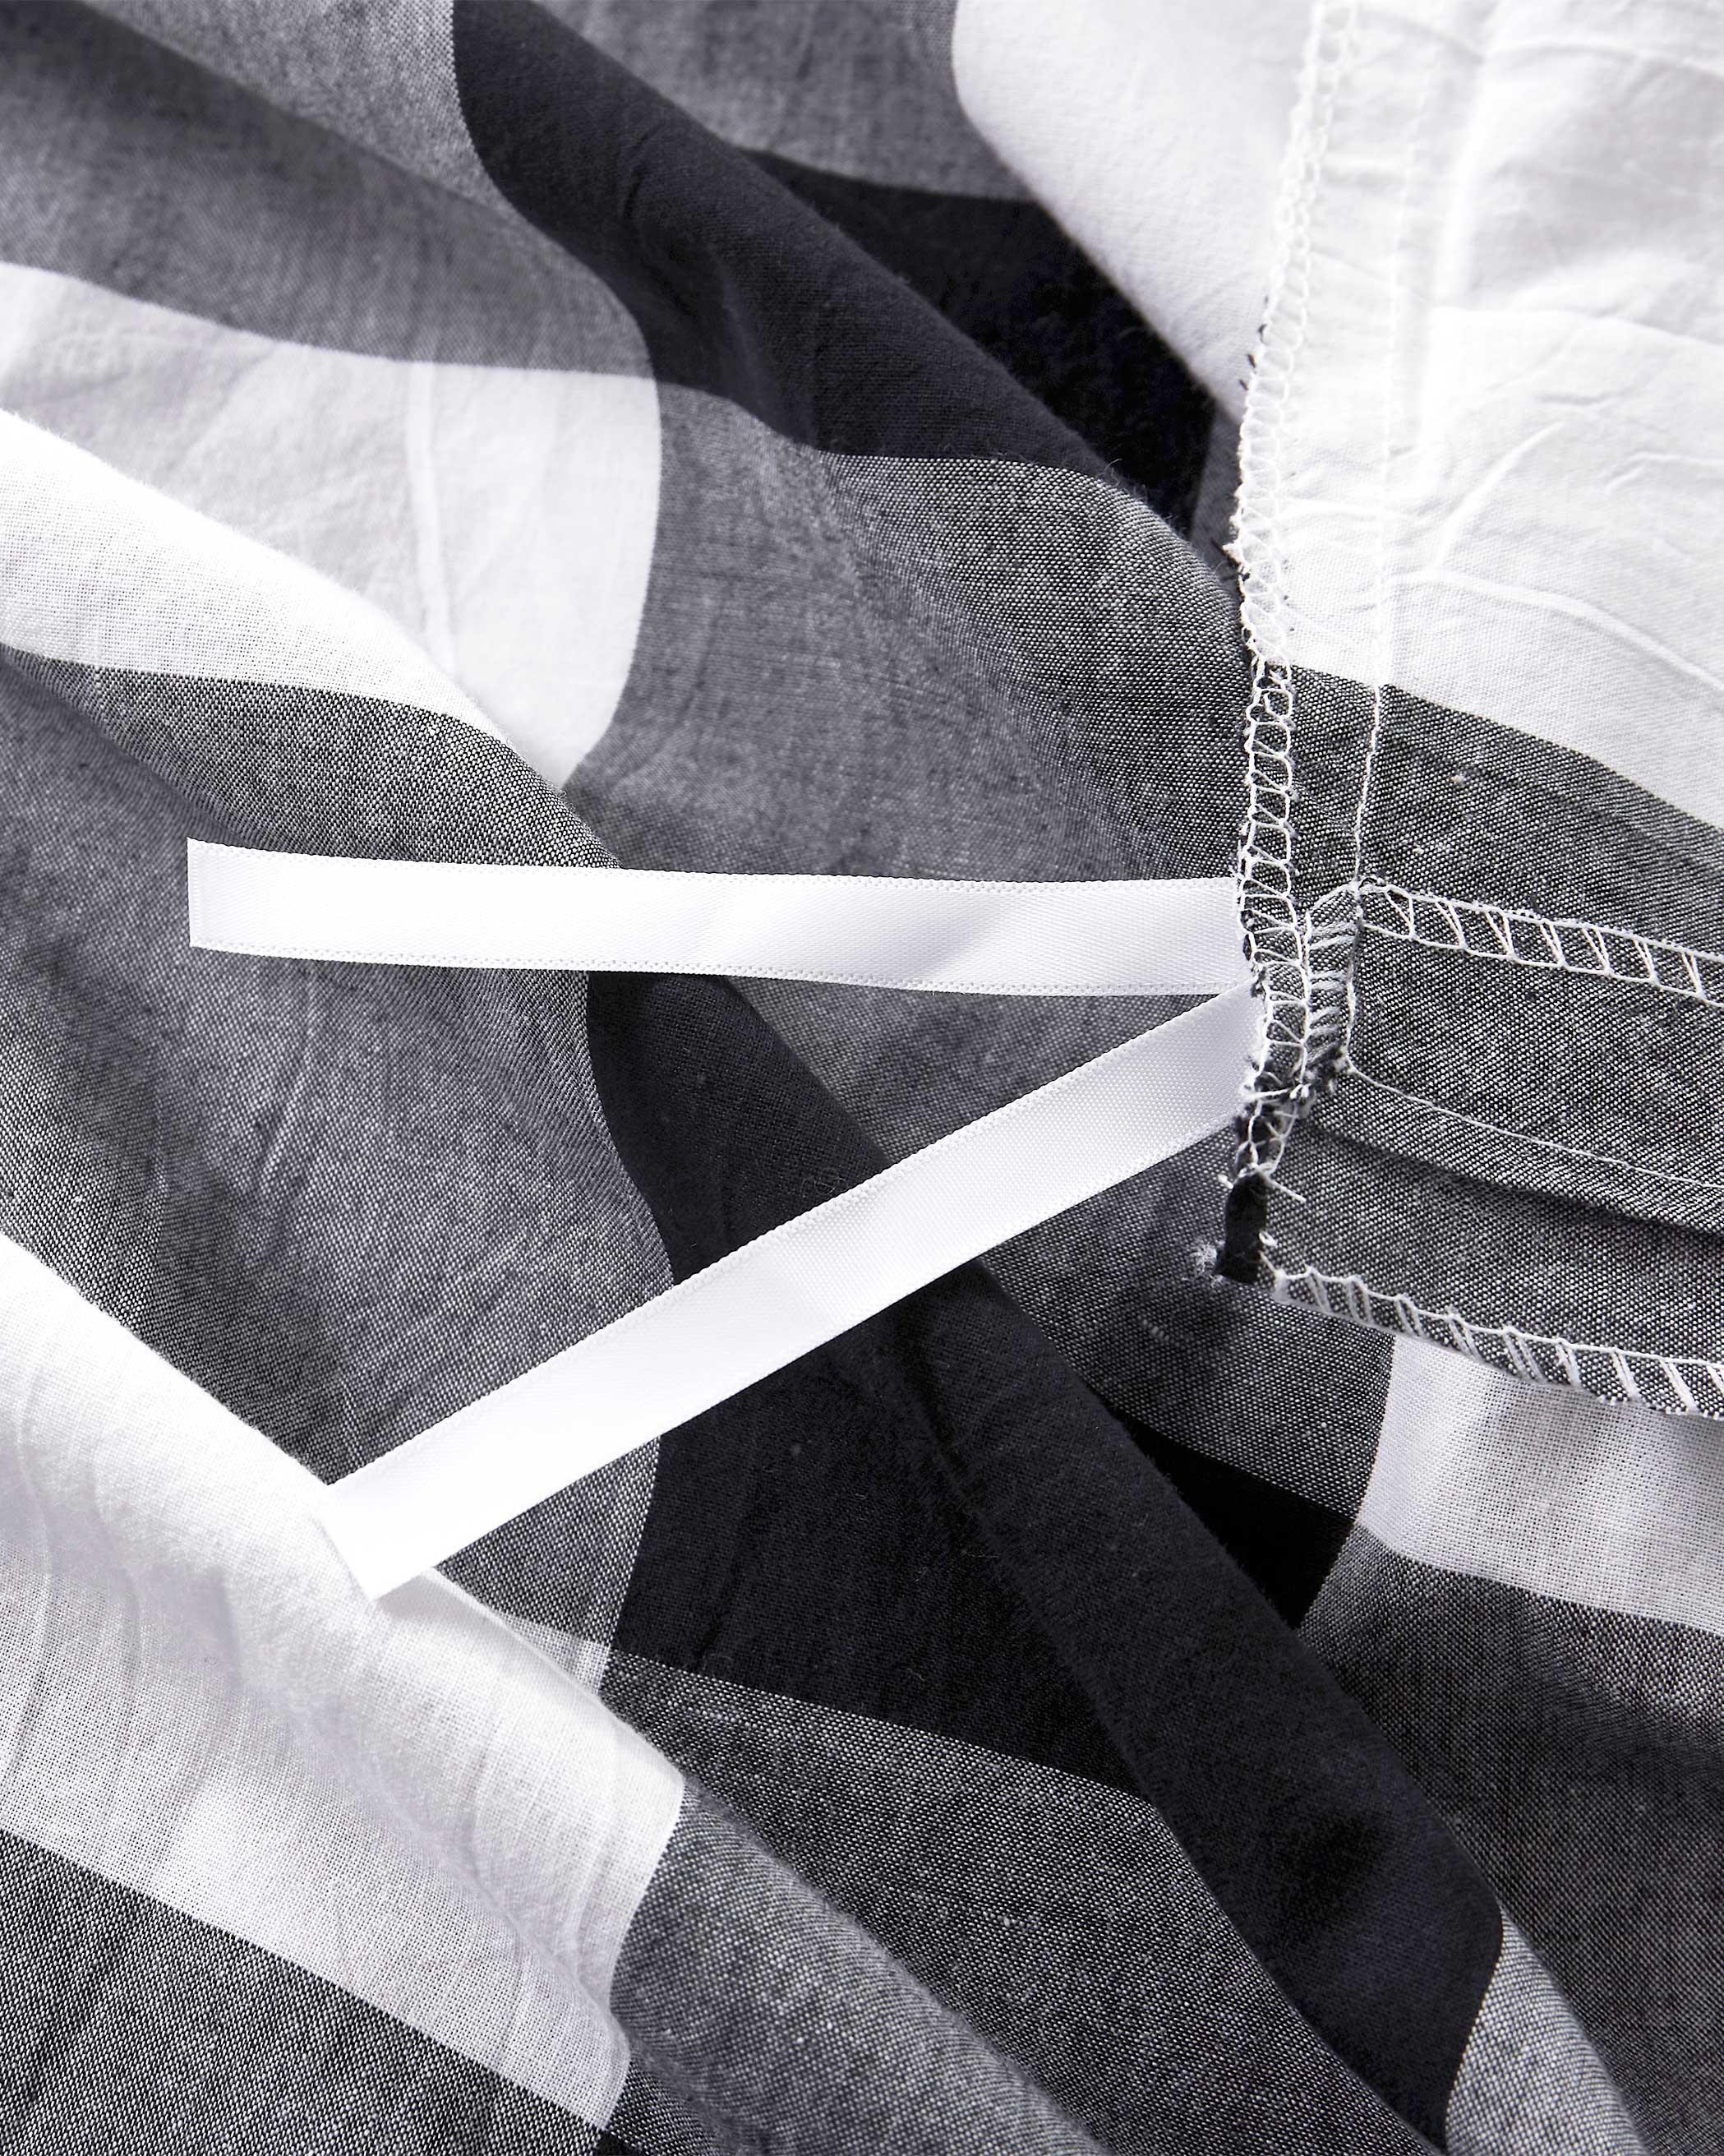 Charcoal Buffalo Check Washed Cotton Duvet Cover Set